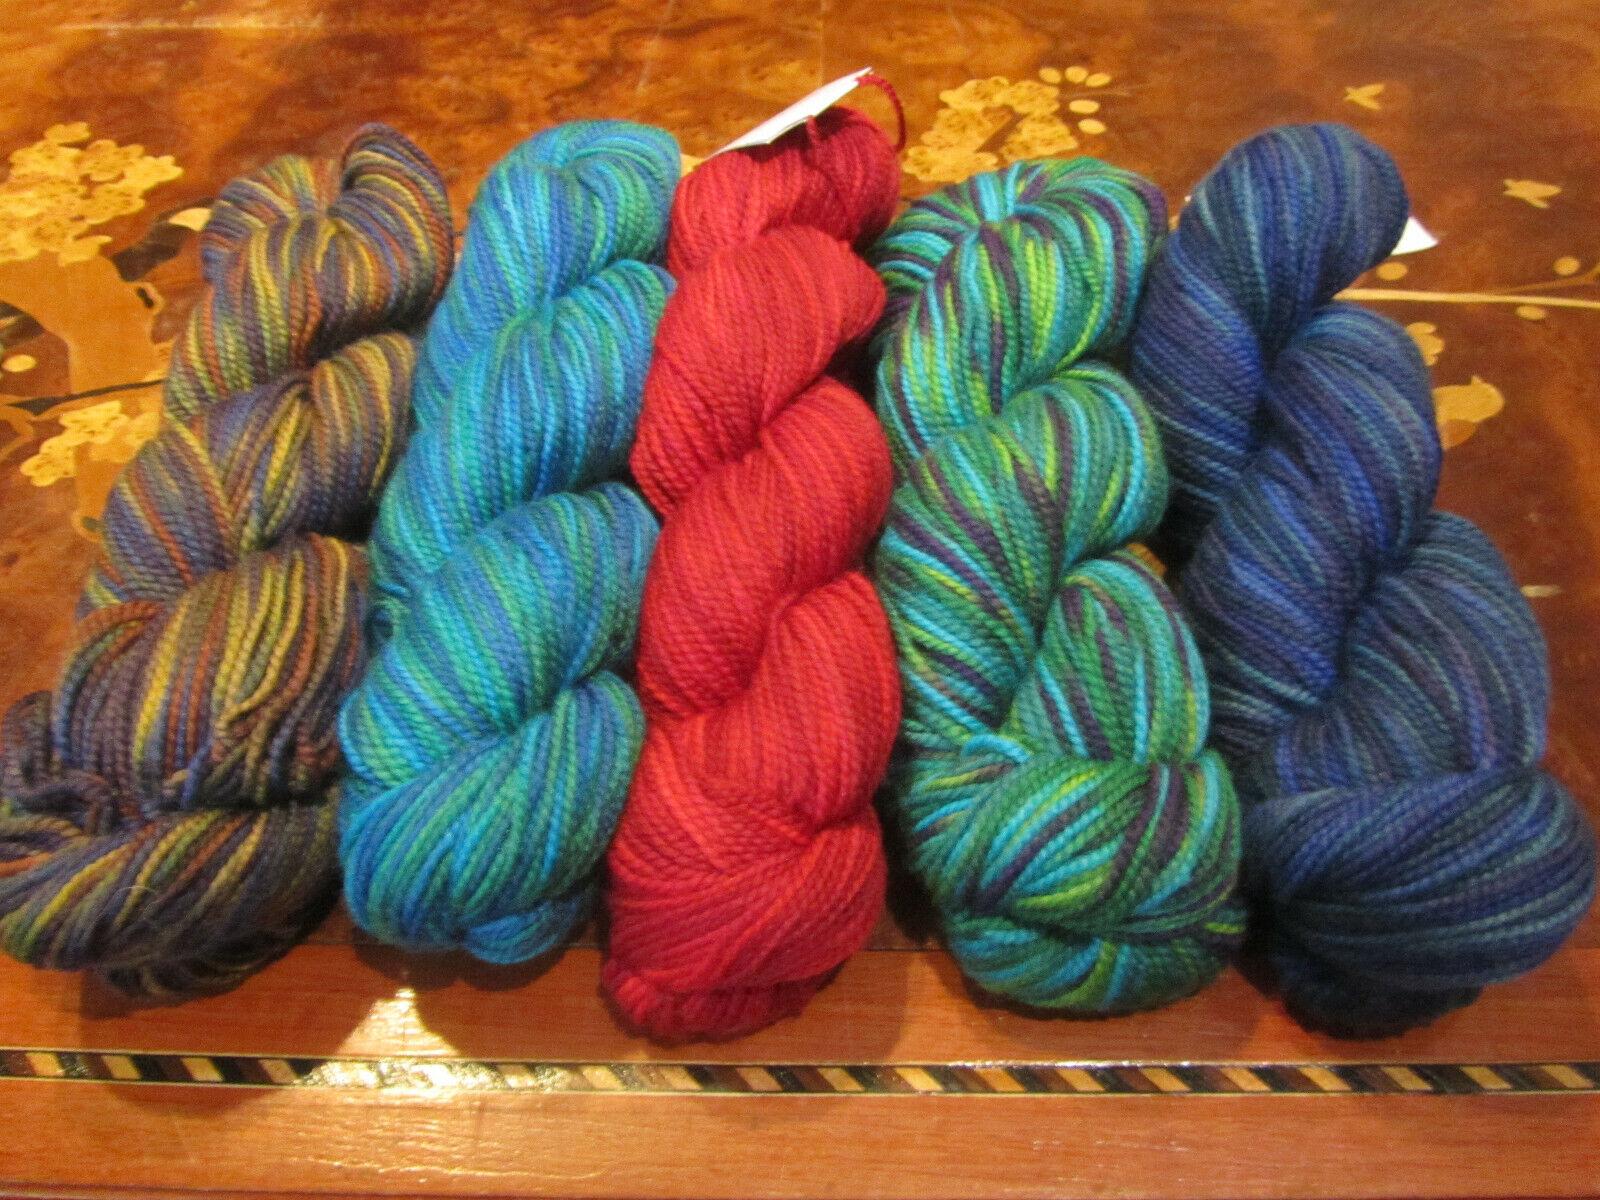 fashion toes sock yarn superwash merino choice